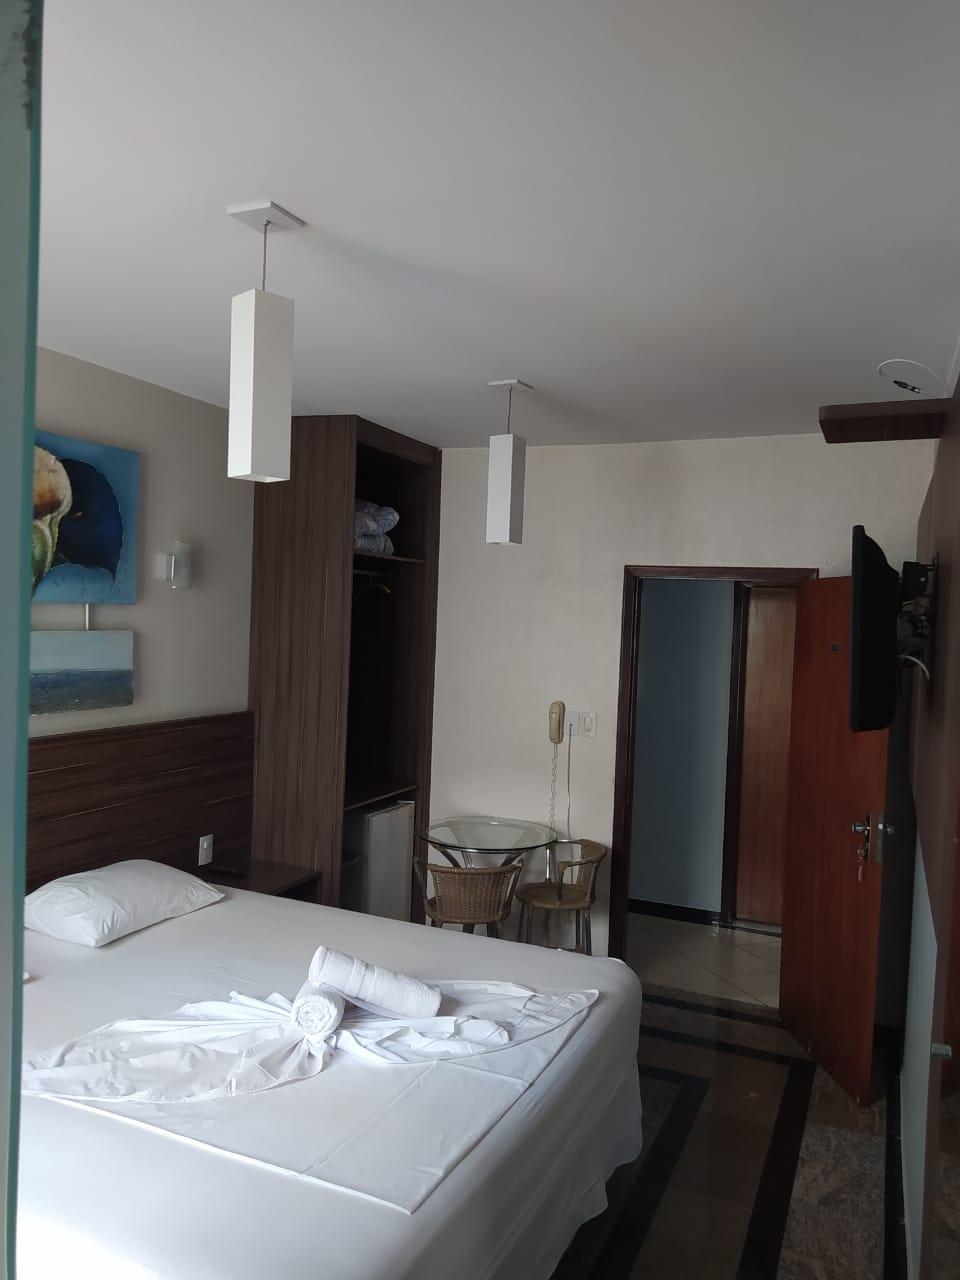 HOTEL-1 ALUGA SE FLATS MOBILLIADOS